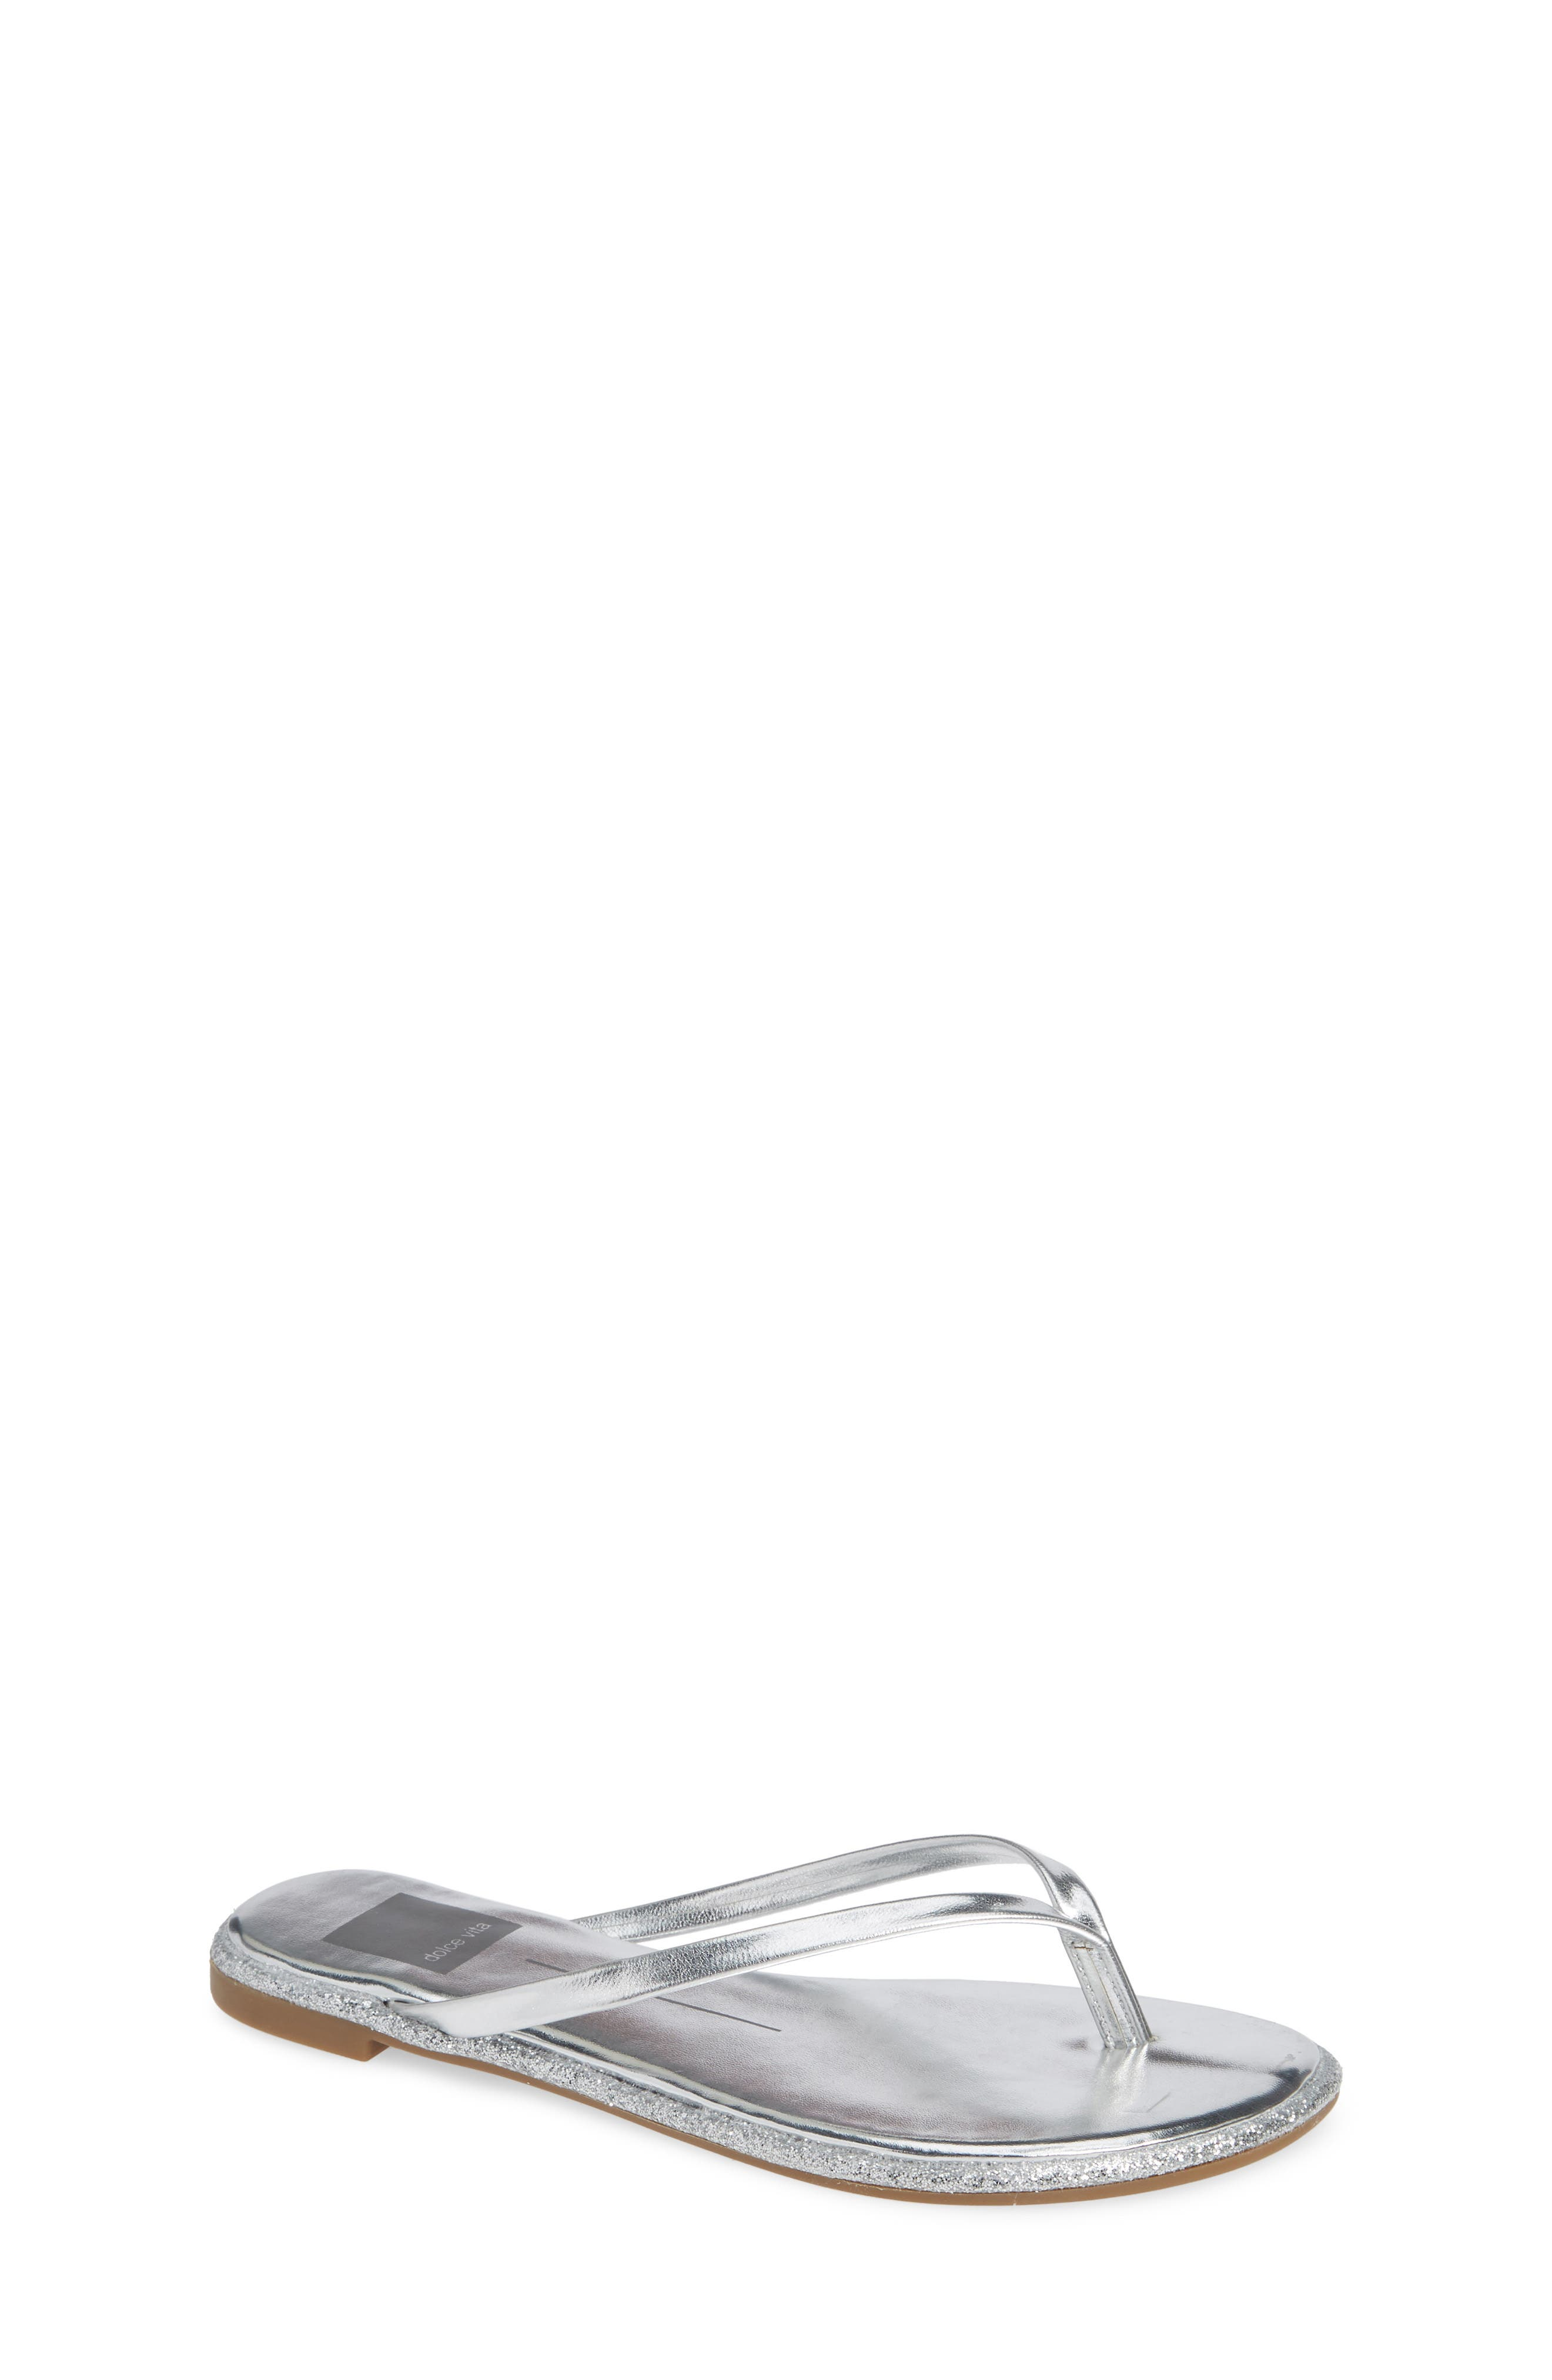 DOLCE VITA Daisy Sparkle Flip Flop, Main, color, SILVER